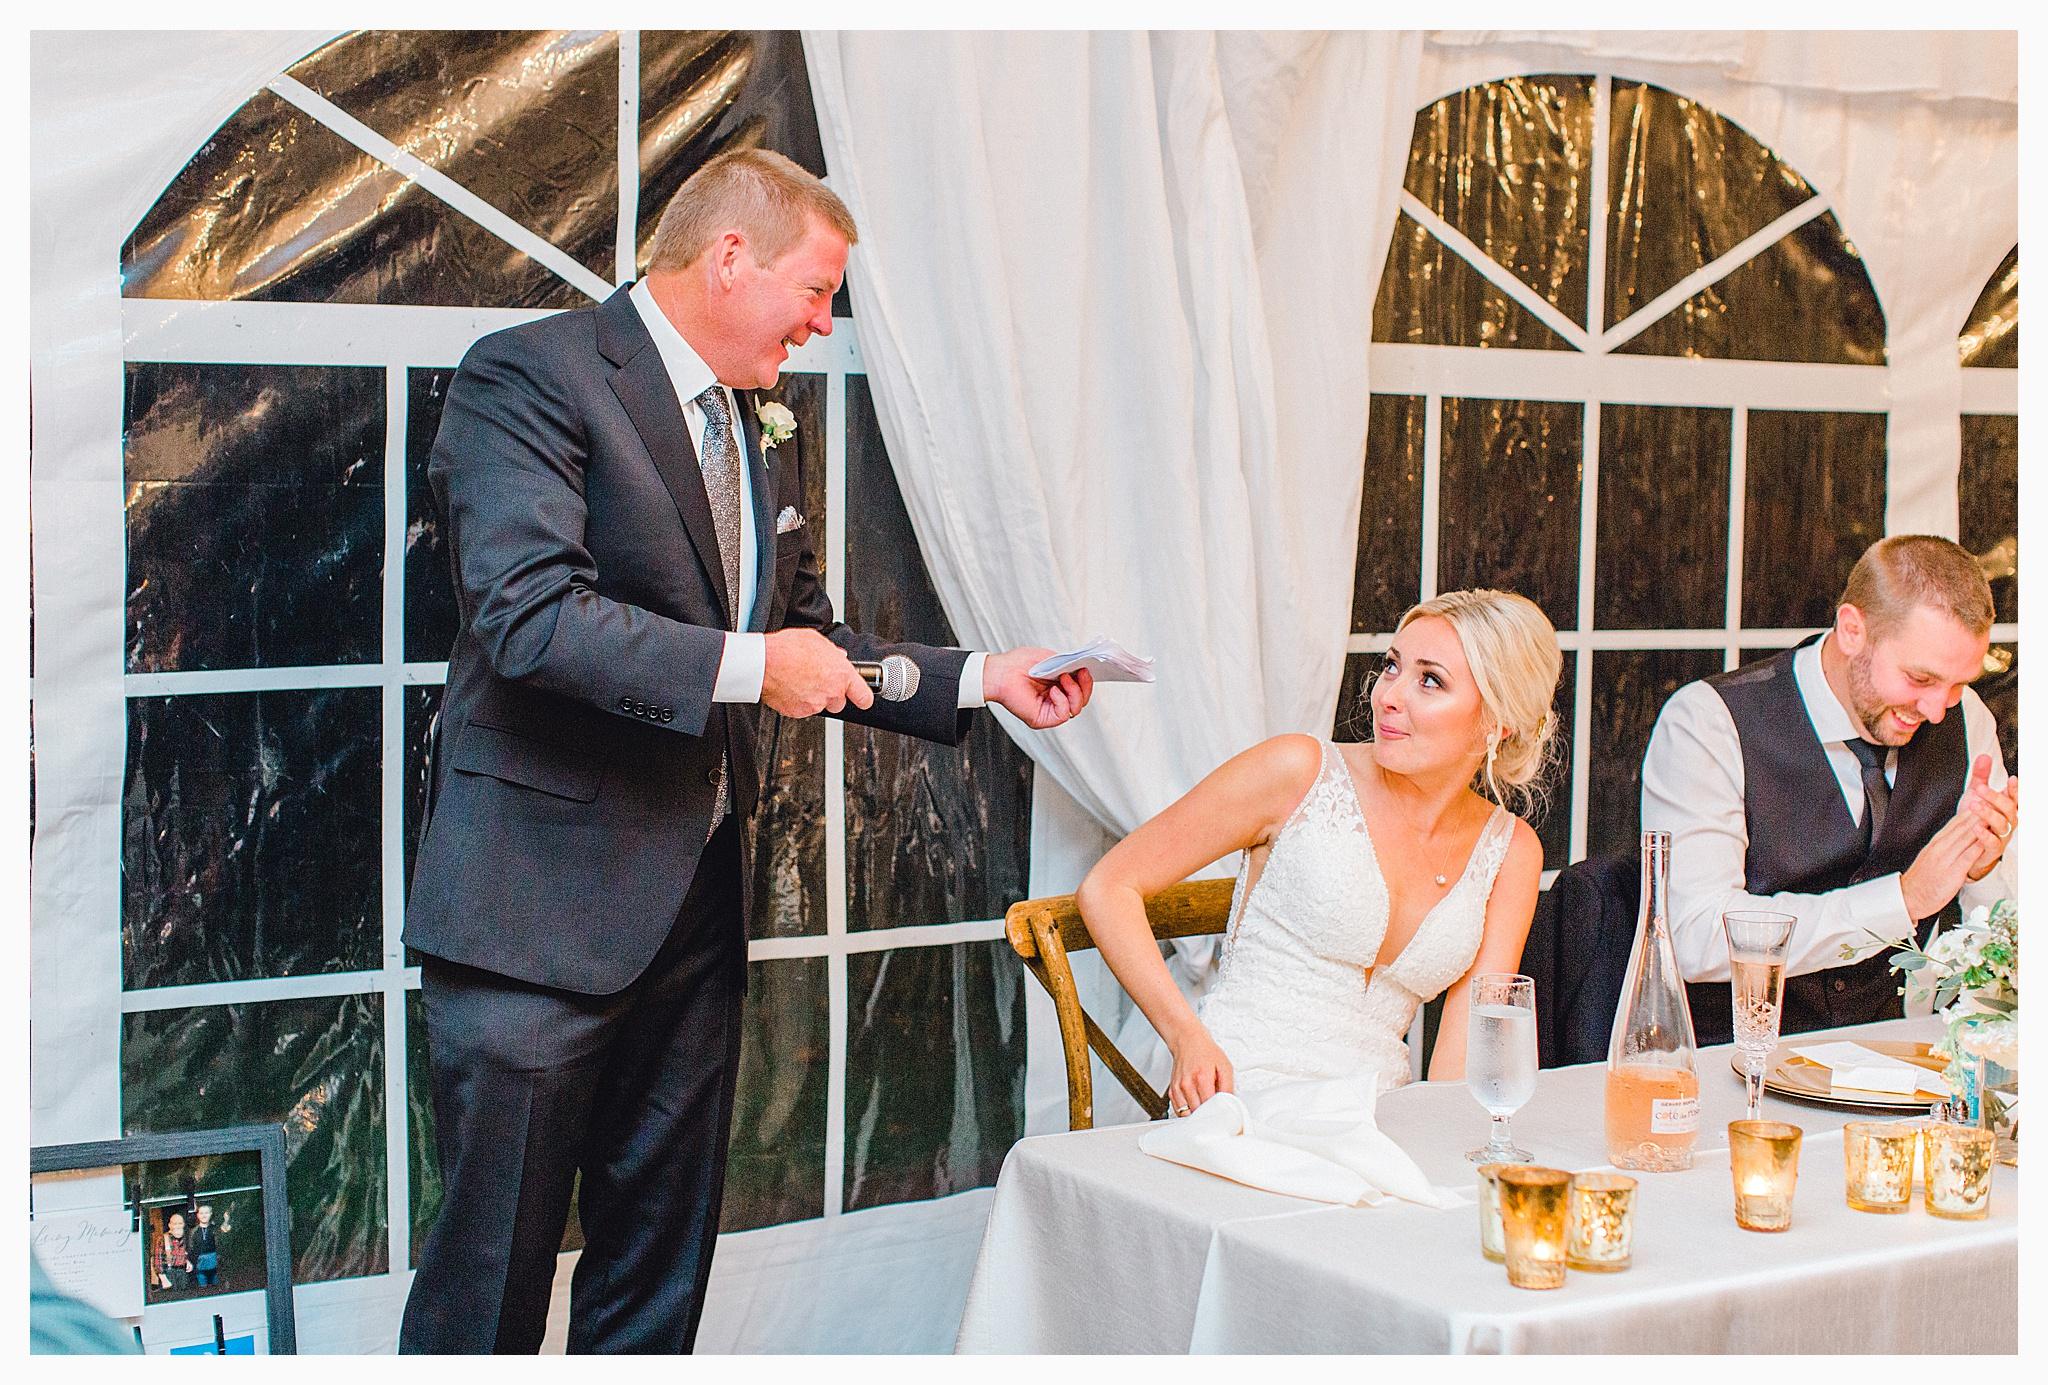 Emma Rose Company Light and Airy Wedding Photographer, Beautiful fall wedding at Rock Creek Gardens Venue in Puyallup, Washington._0098.jpg